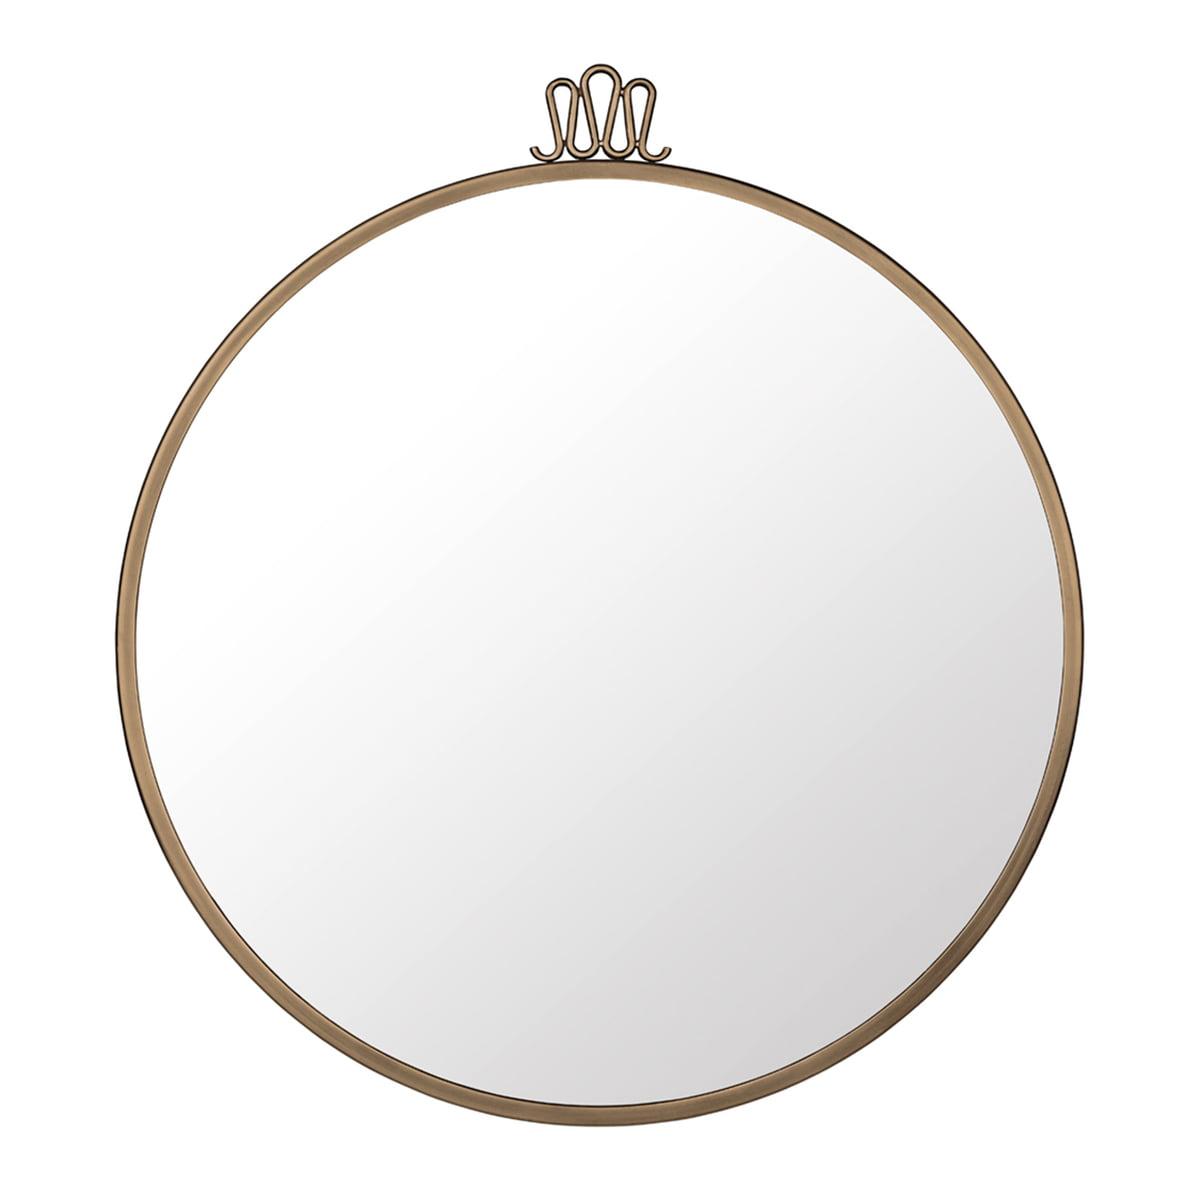 Randaccio Wall Mirror By Gubi Connox